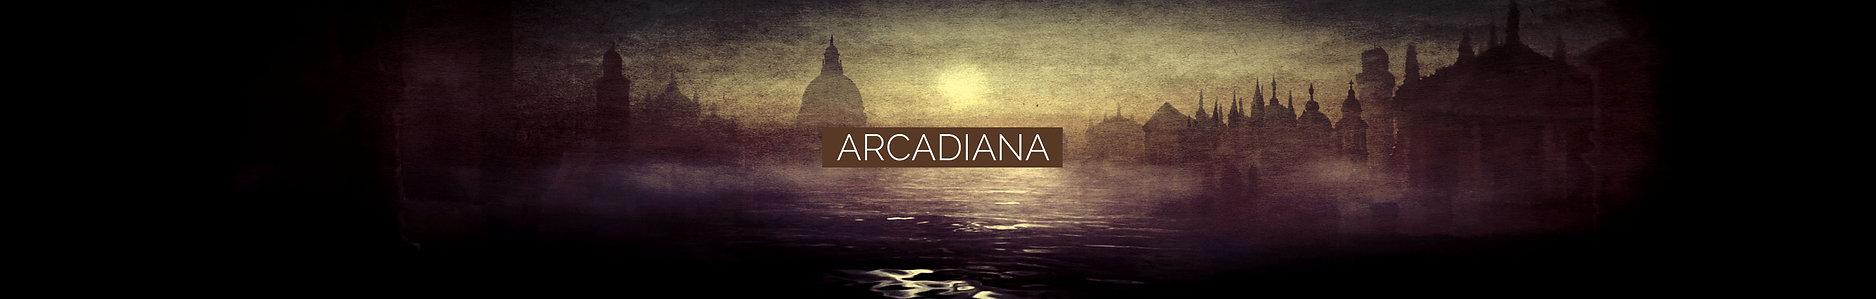 BANNERS_Arcadiana.3.jpg